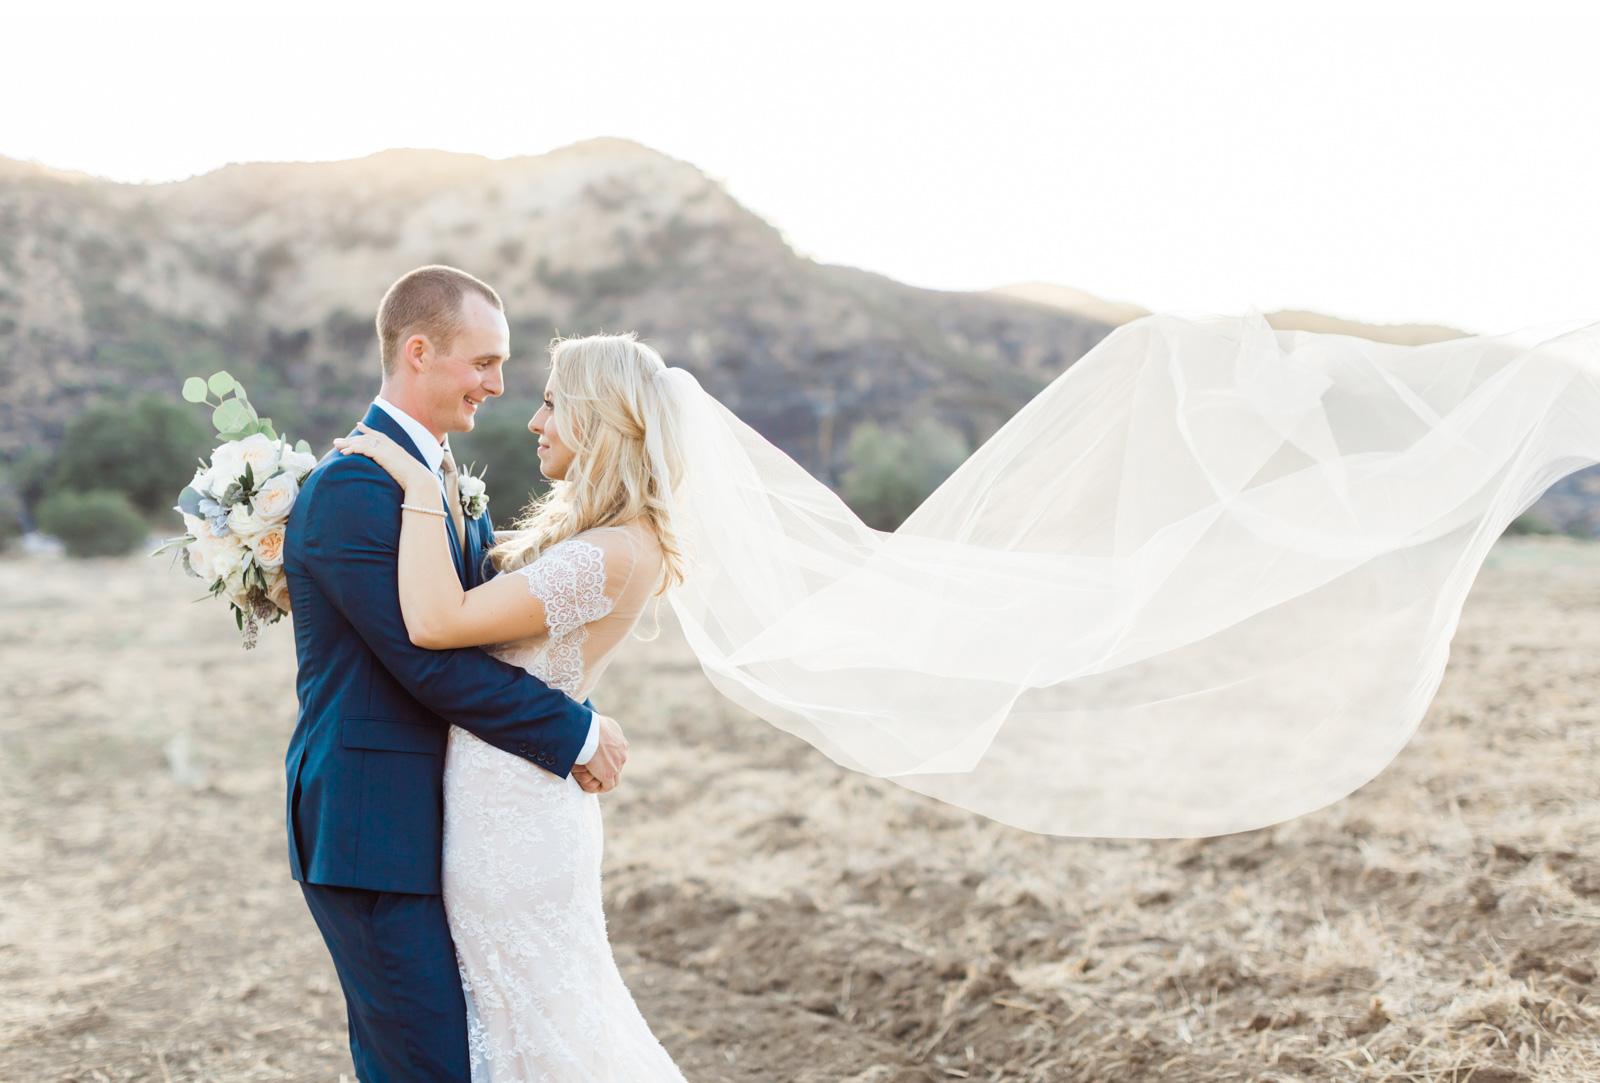 California-Wedding-Photographer-Style-Me-Pretty-Natalie-Schutt-San-Luis-Obispo_03.jpg